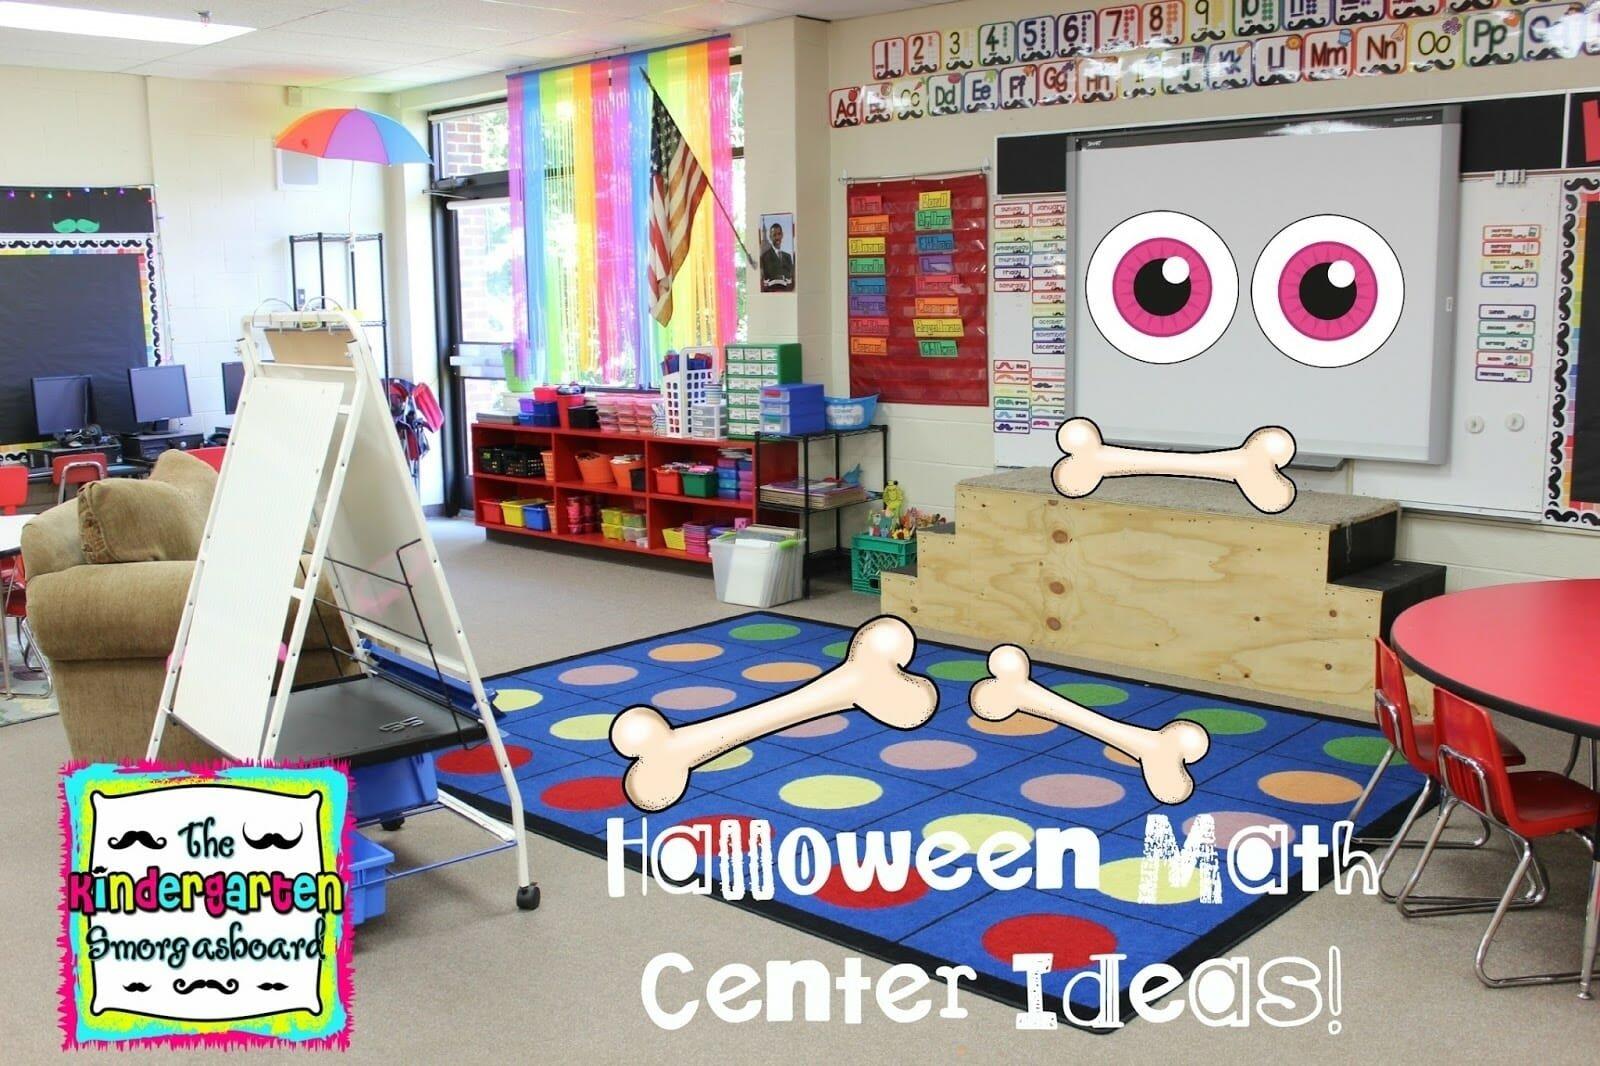 10 Attractive Math Center Ideas For Kindergarten a kindergarten smorgasboard of halloween math center ideas the 2021